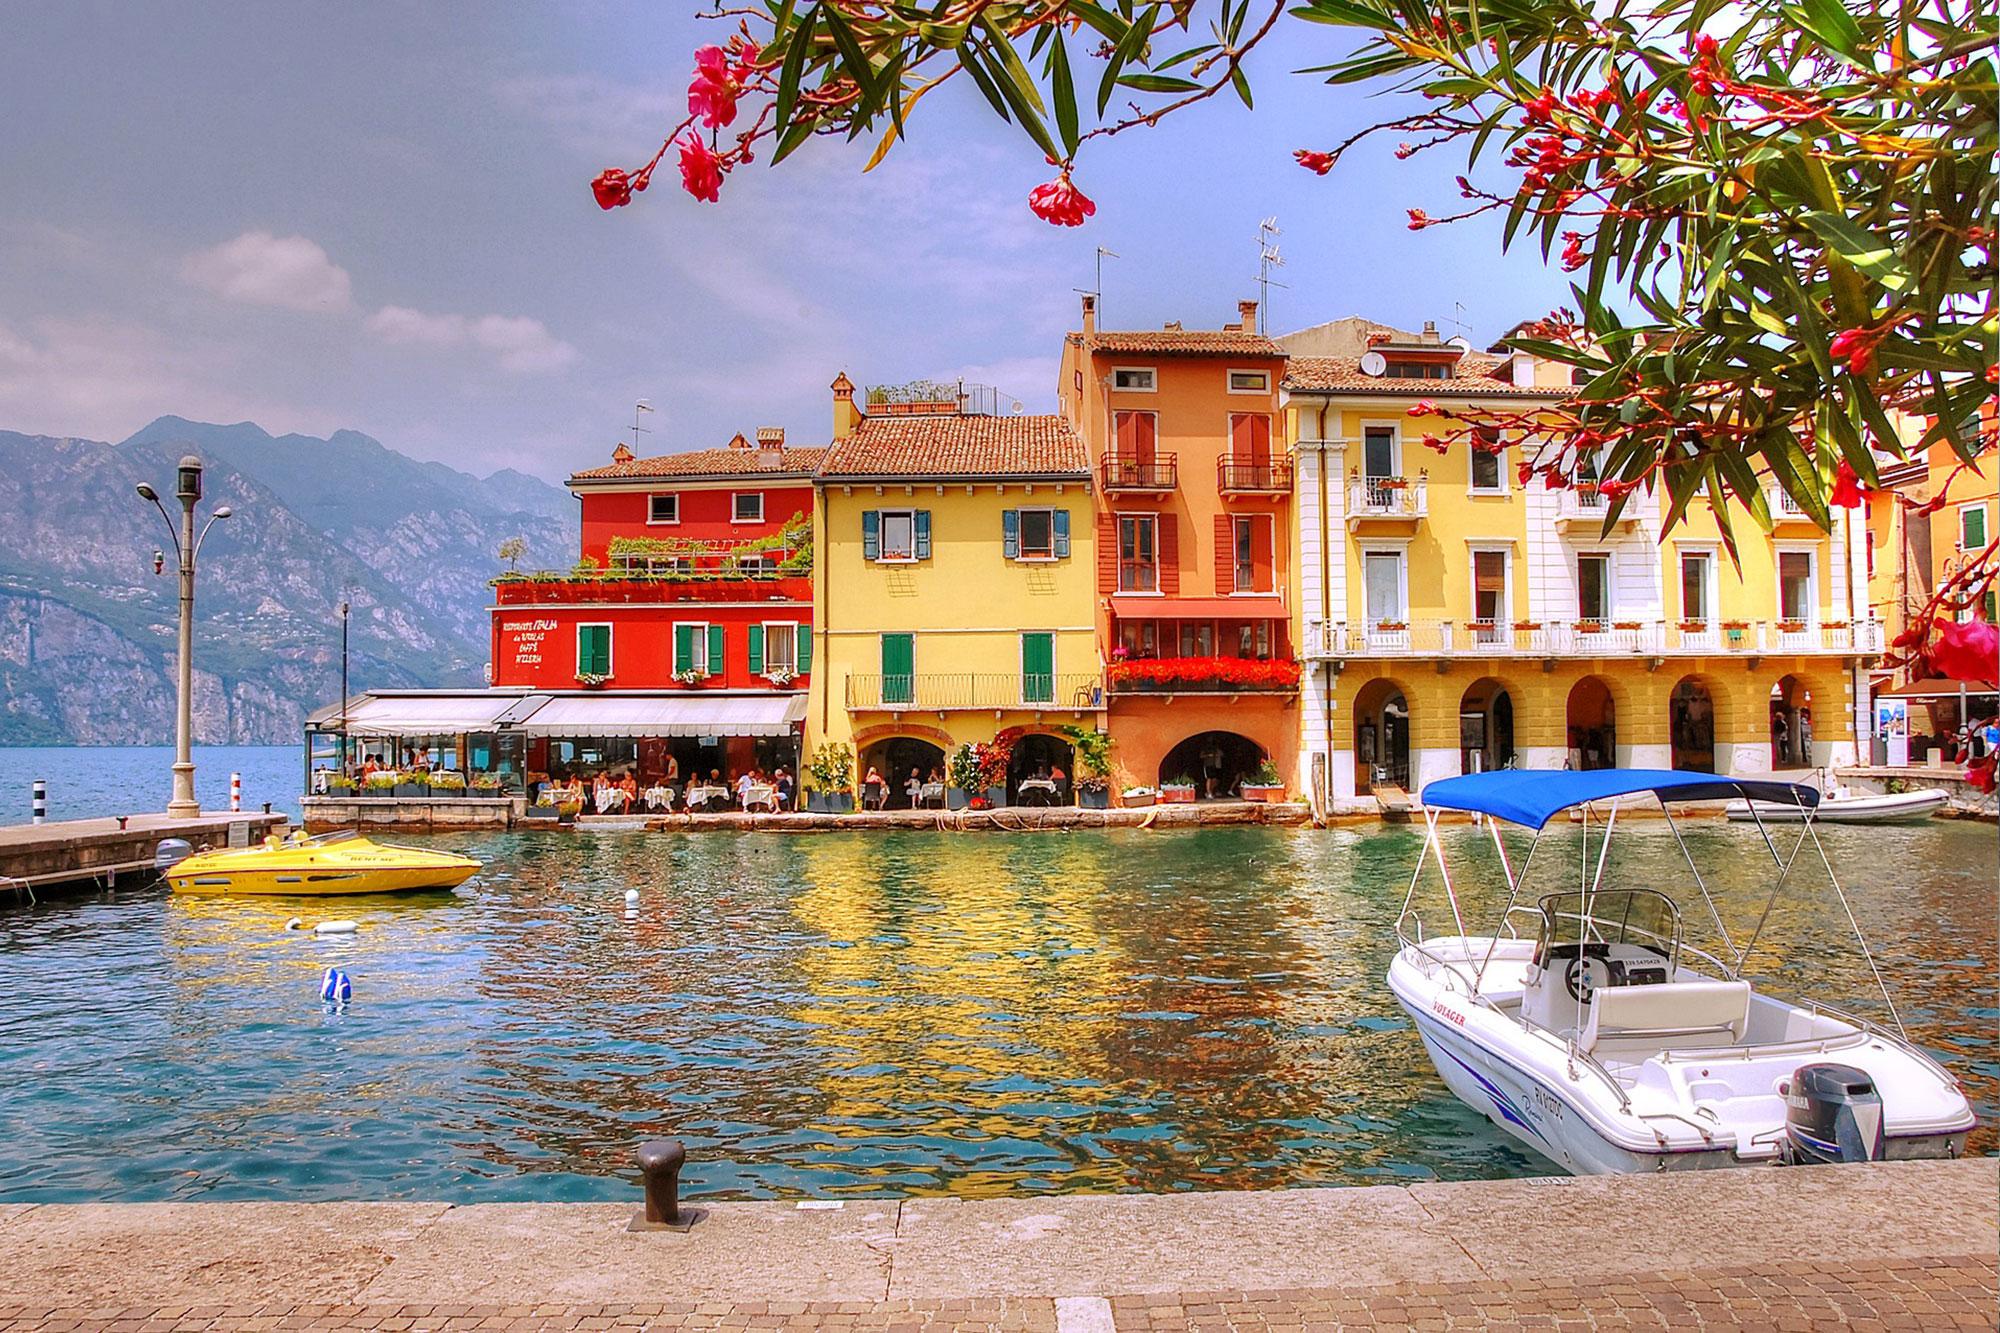 Tagesreise Gardasee